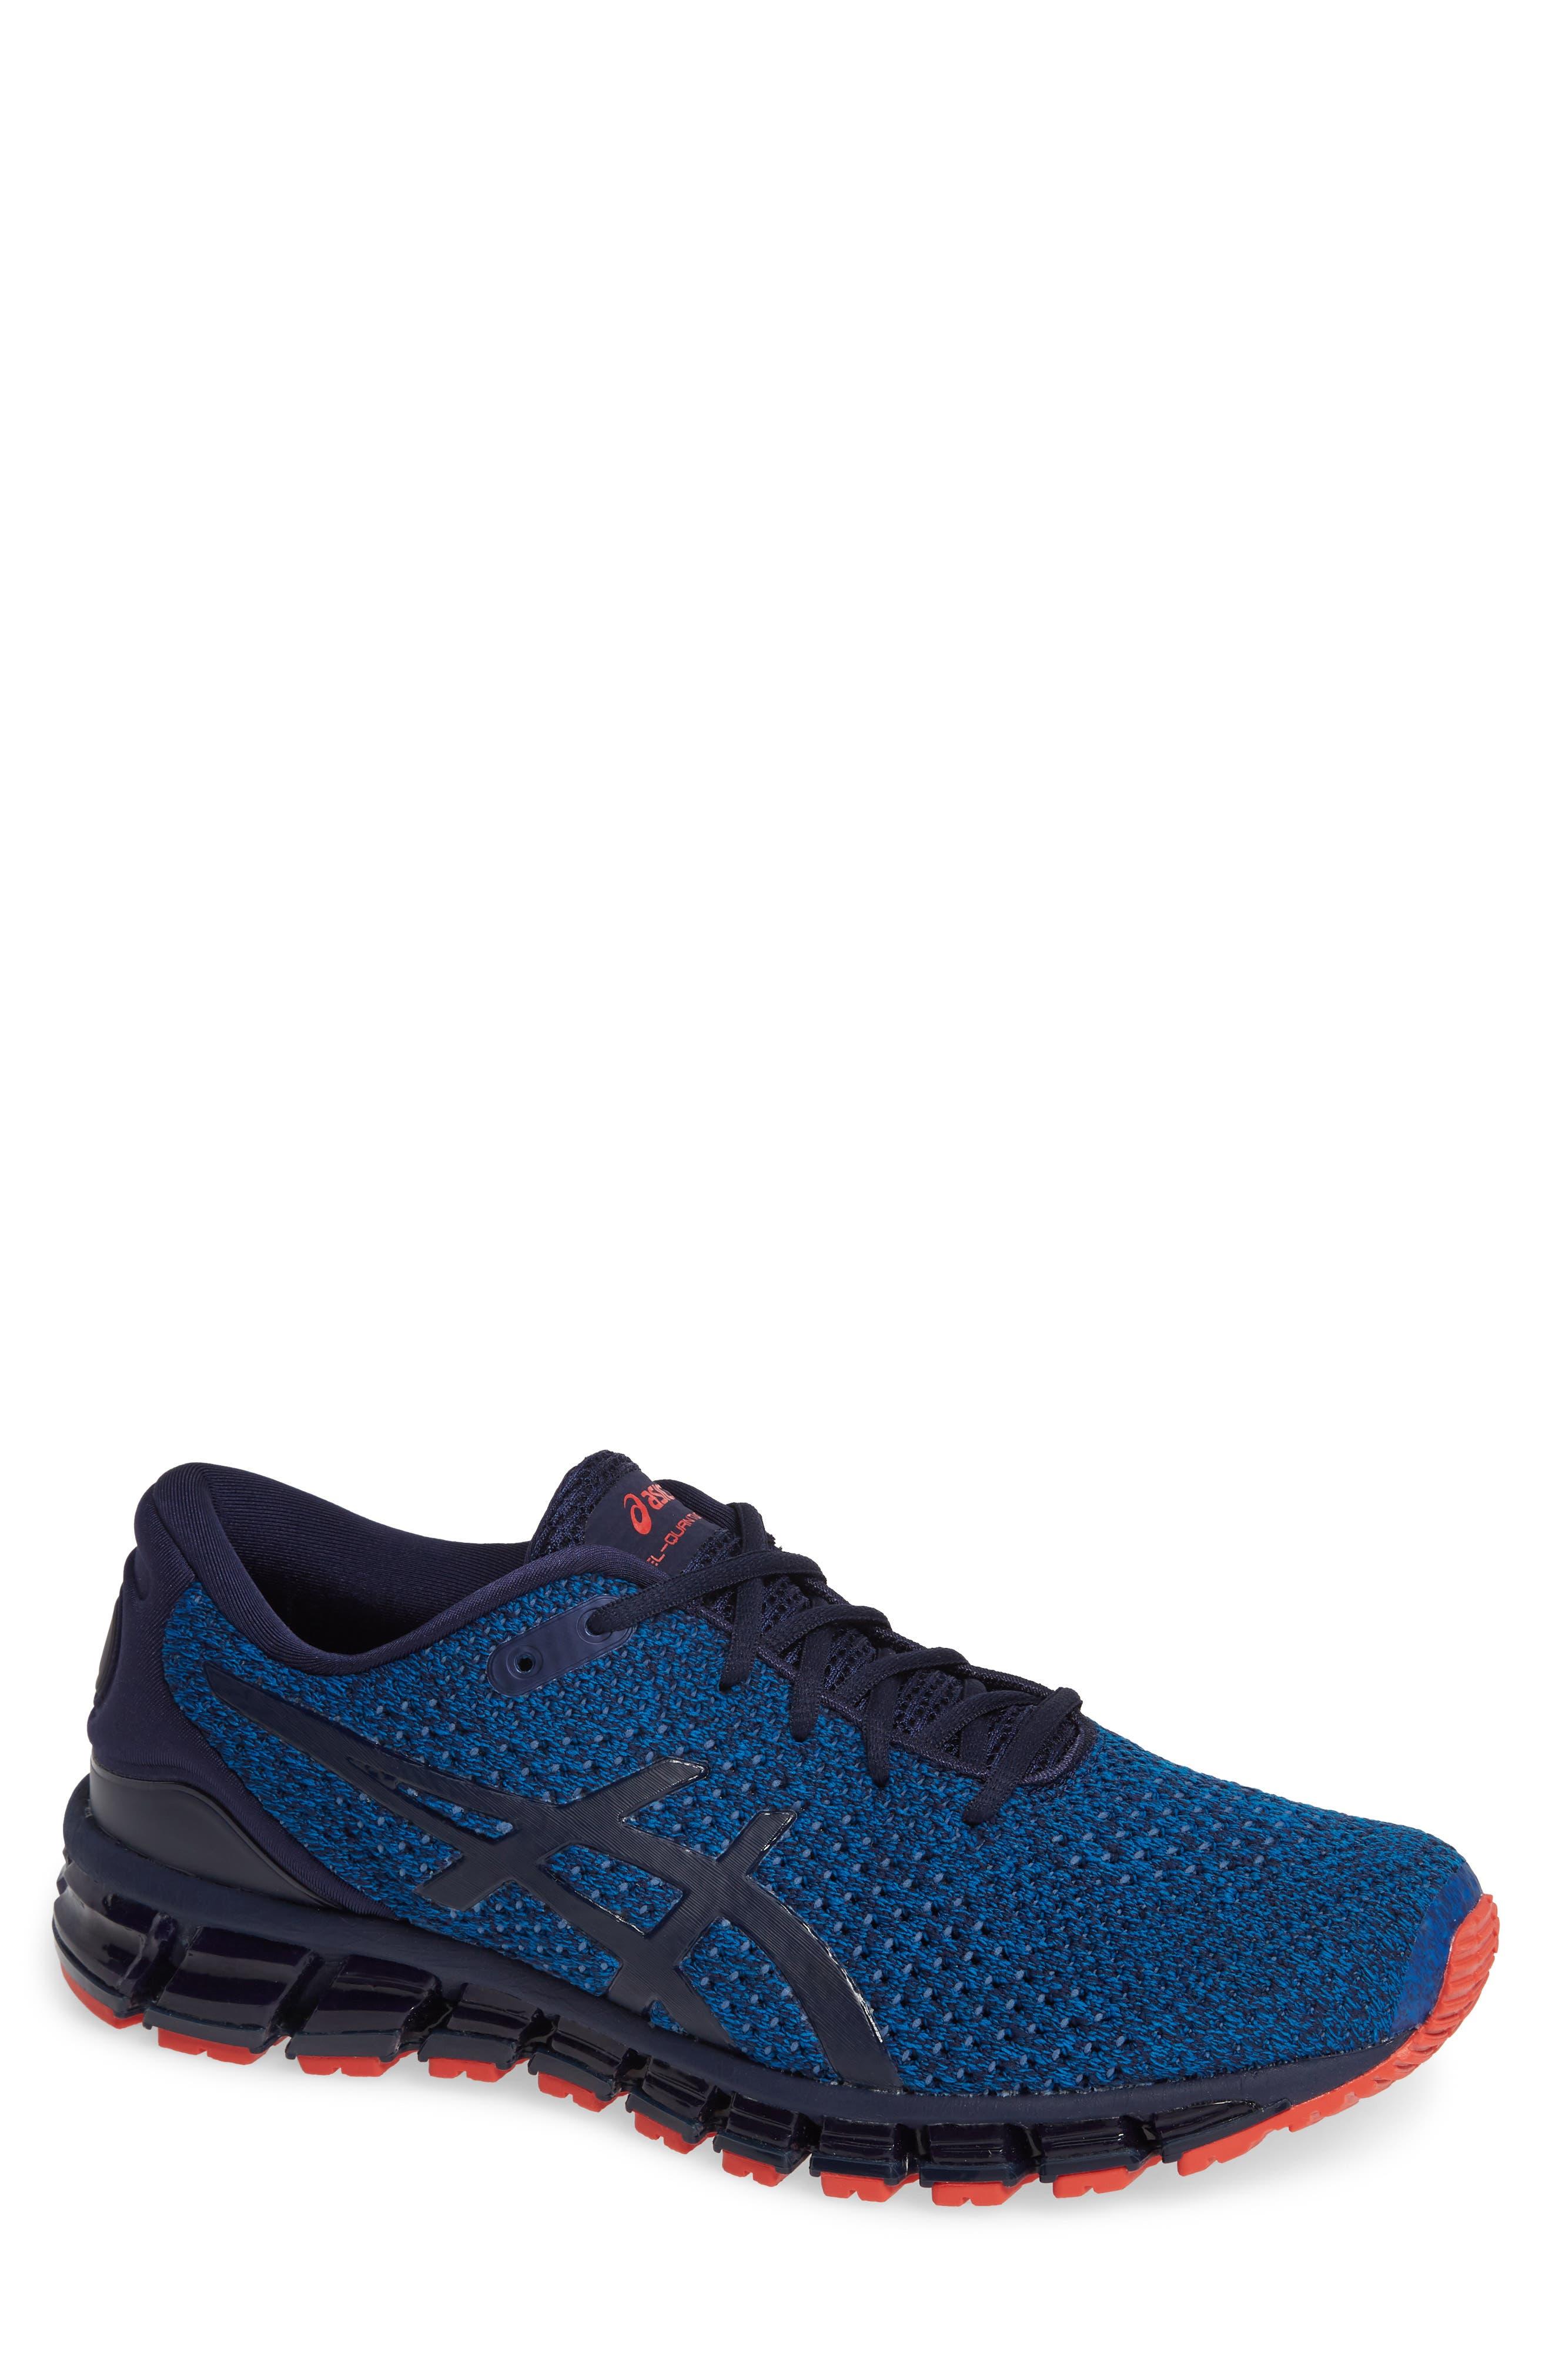 GEL-Quantum 360 Running Shoe,                             Main thumbnail 1, color,                             RACE BLUE